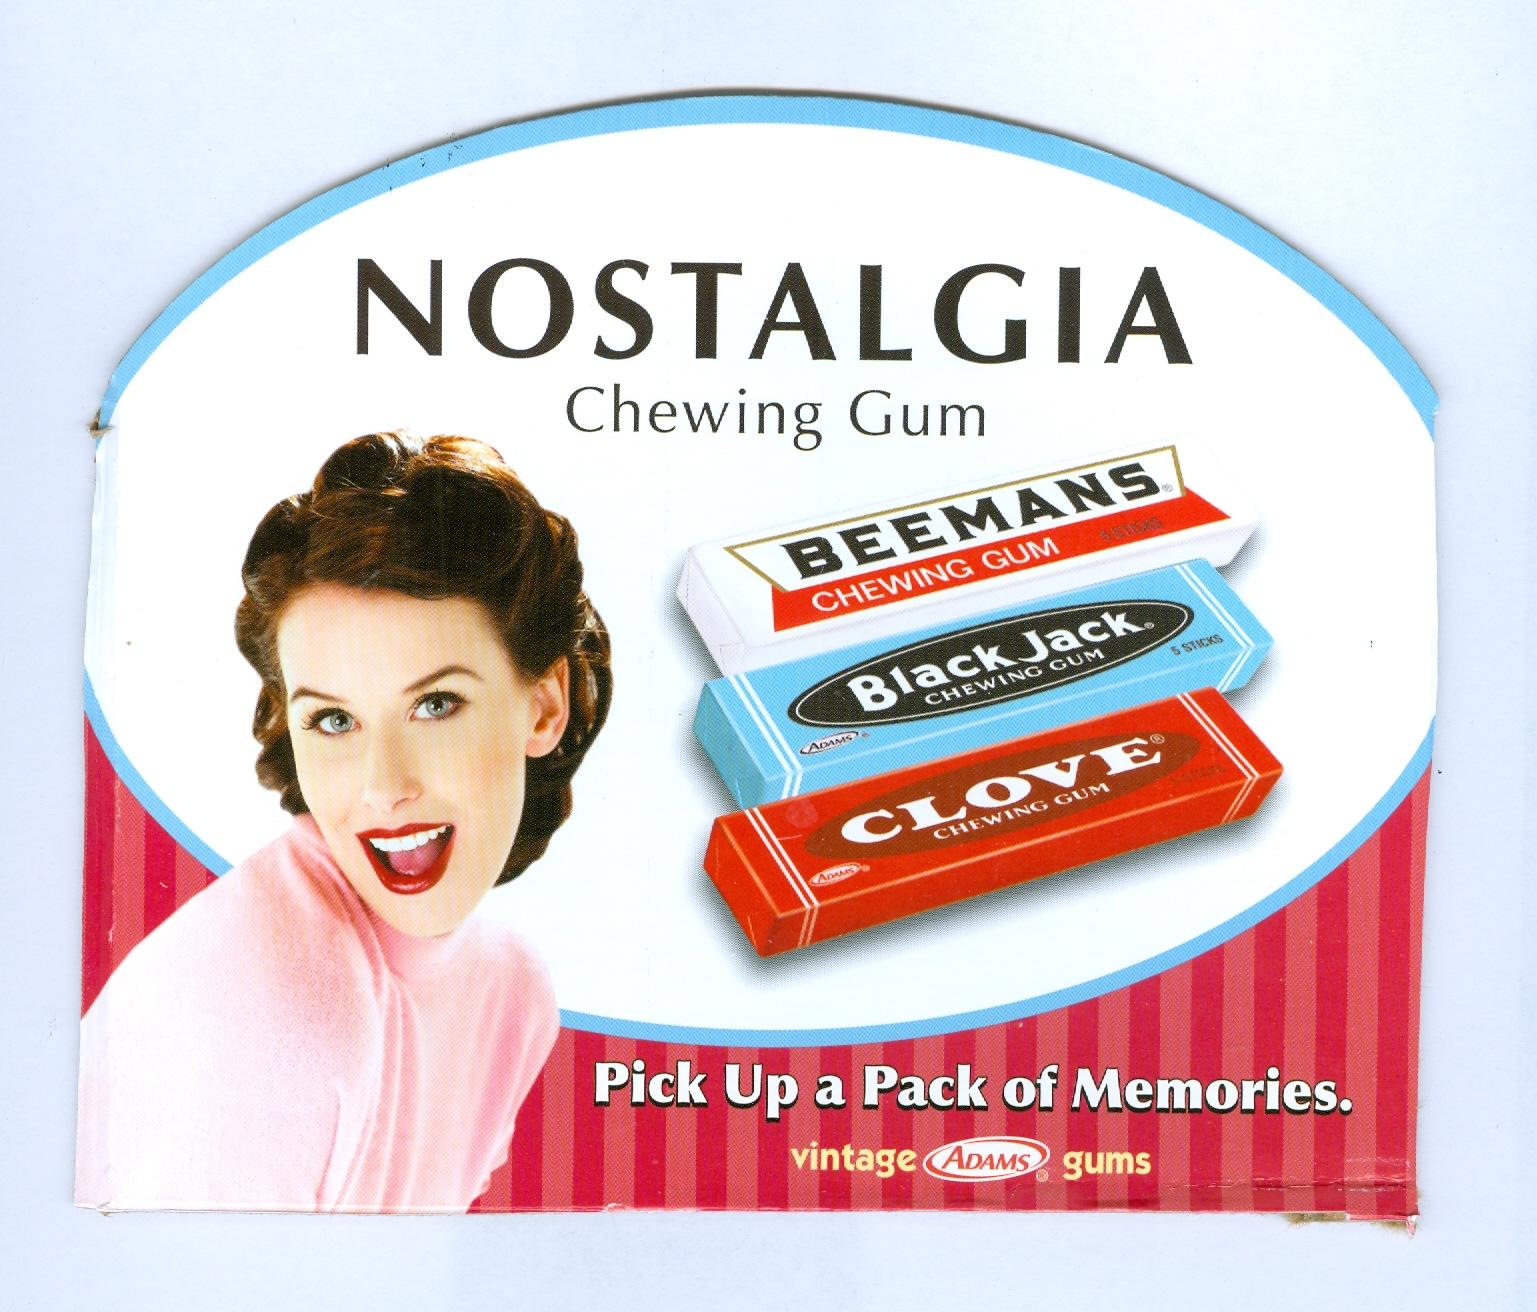 where can i find black jack gum